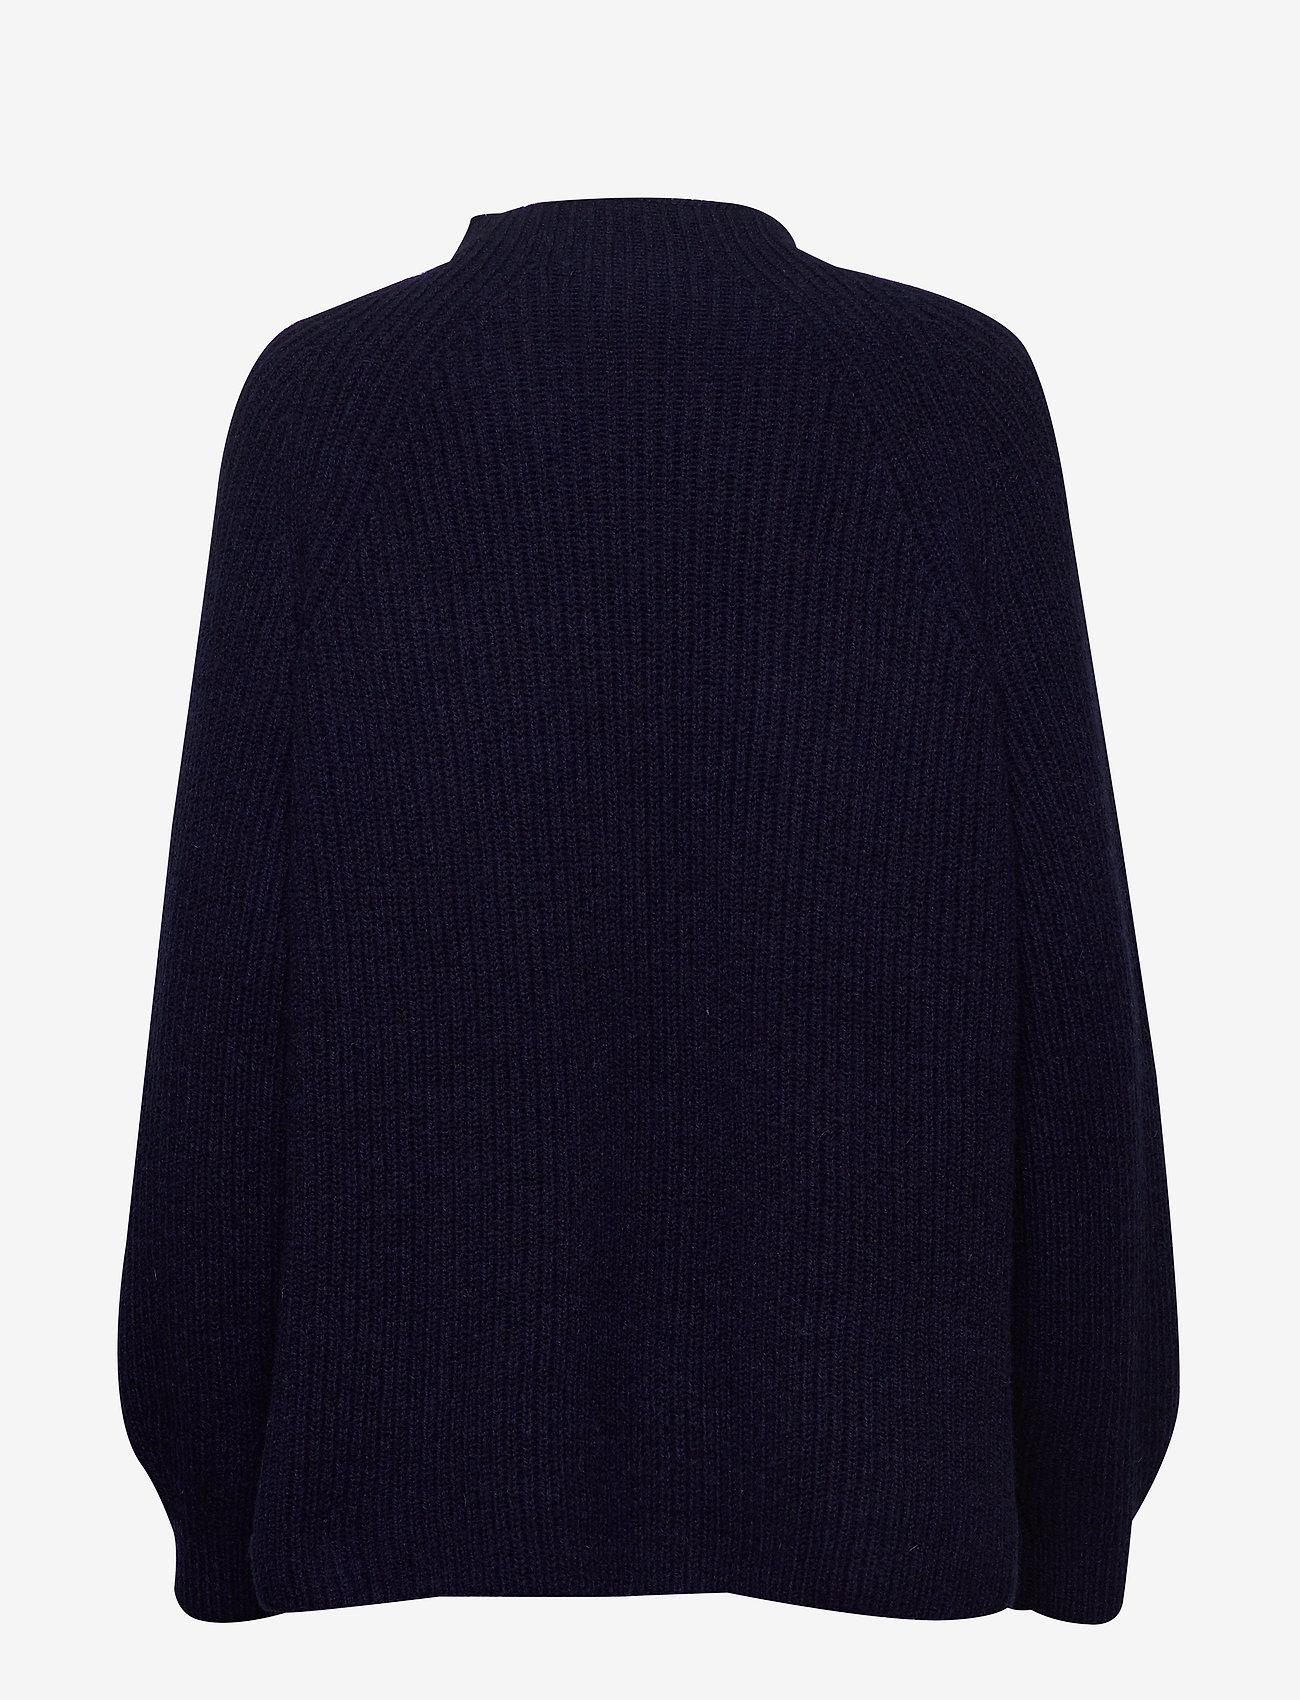 Blank Sweater (Dk Navy) - Hope yj7dC5